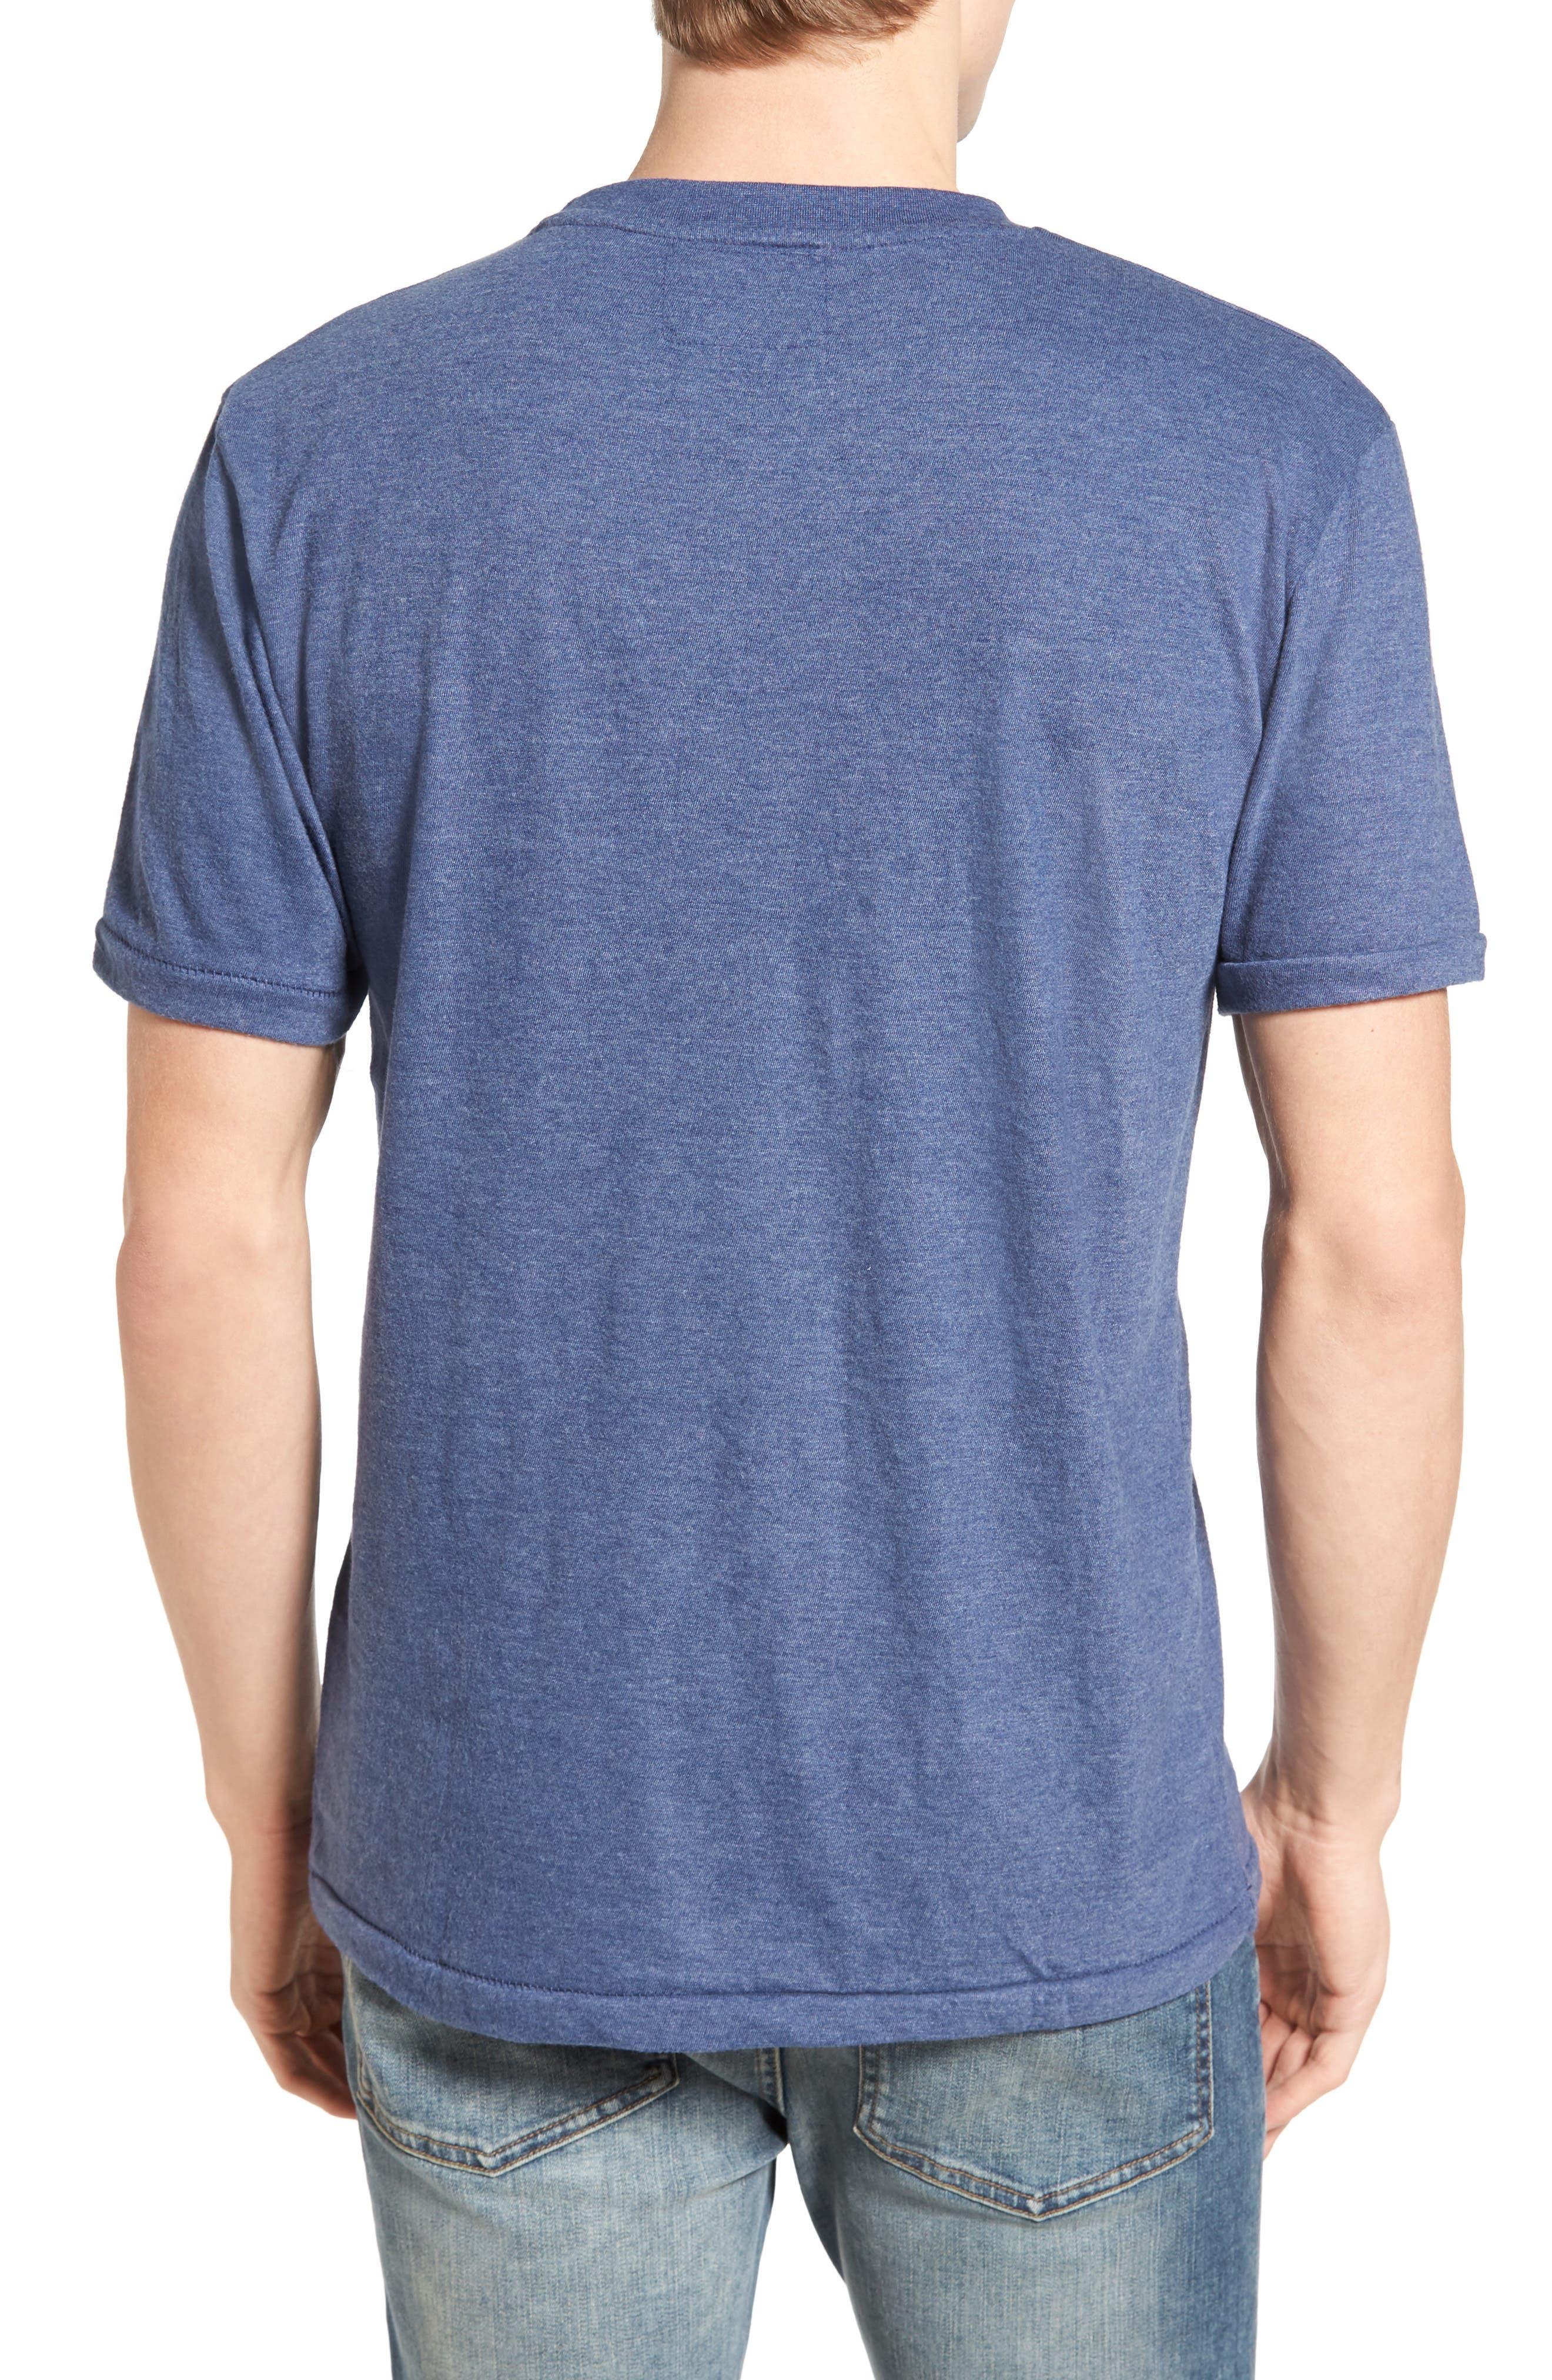 Hillwood Houston Astros T-Shirt,                             Alternate thumbnail 2, color,                             Heather Navy